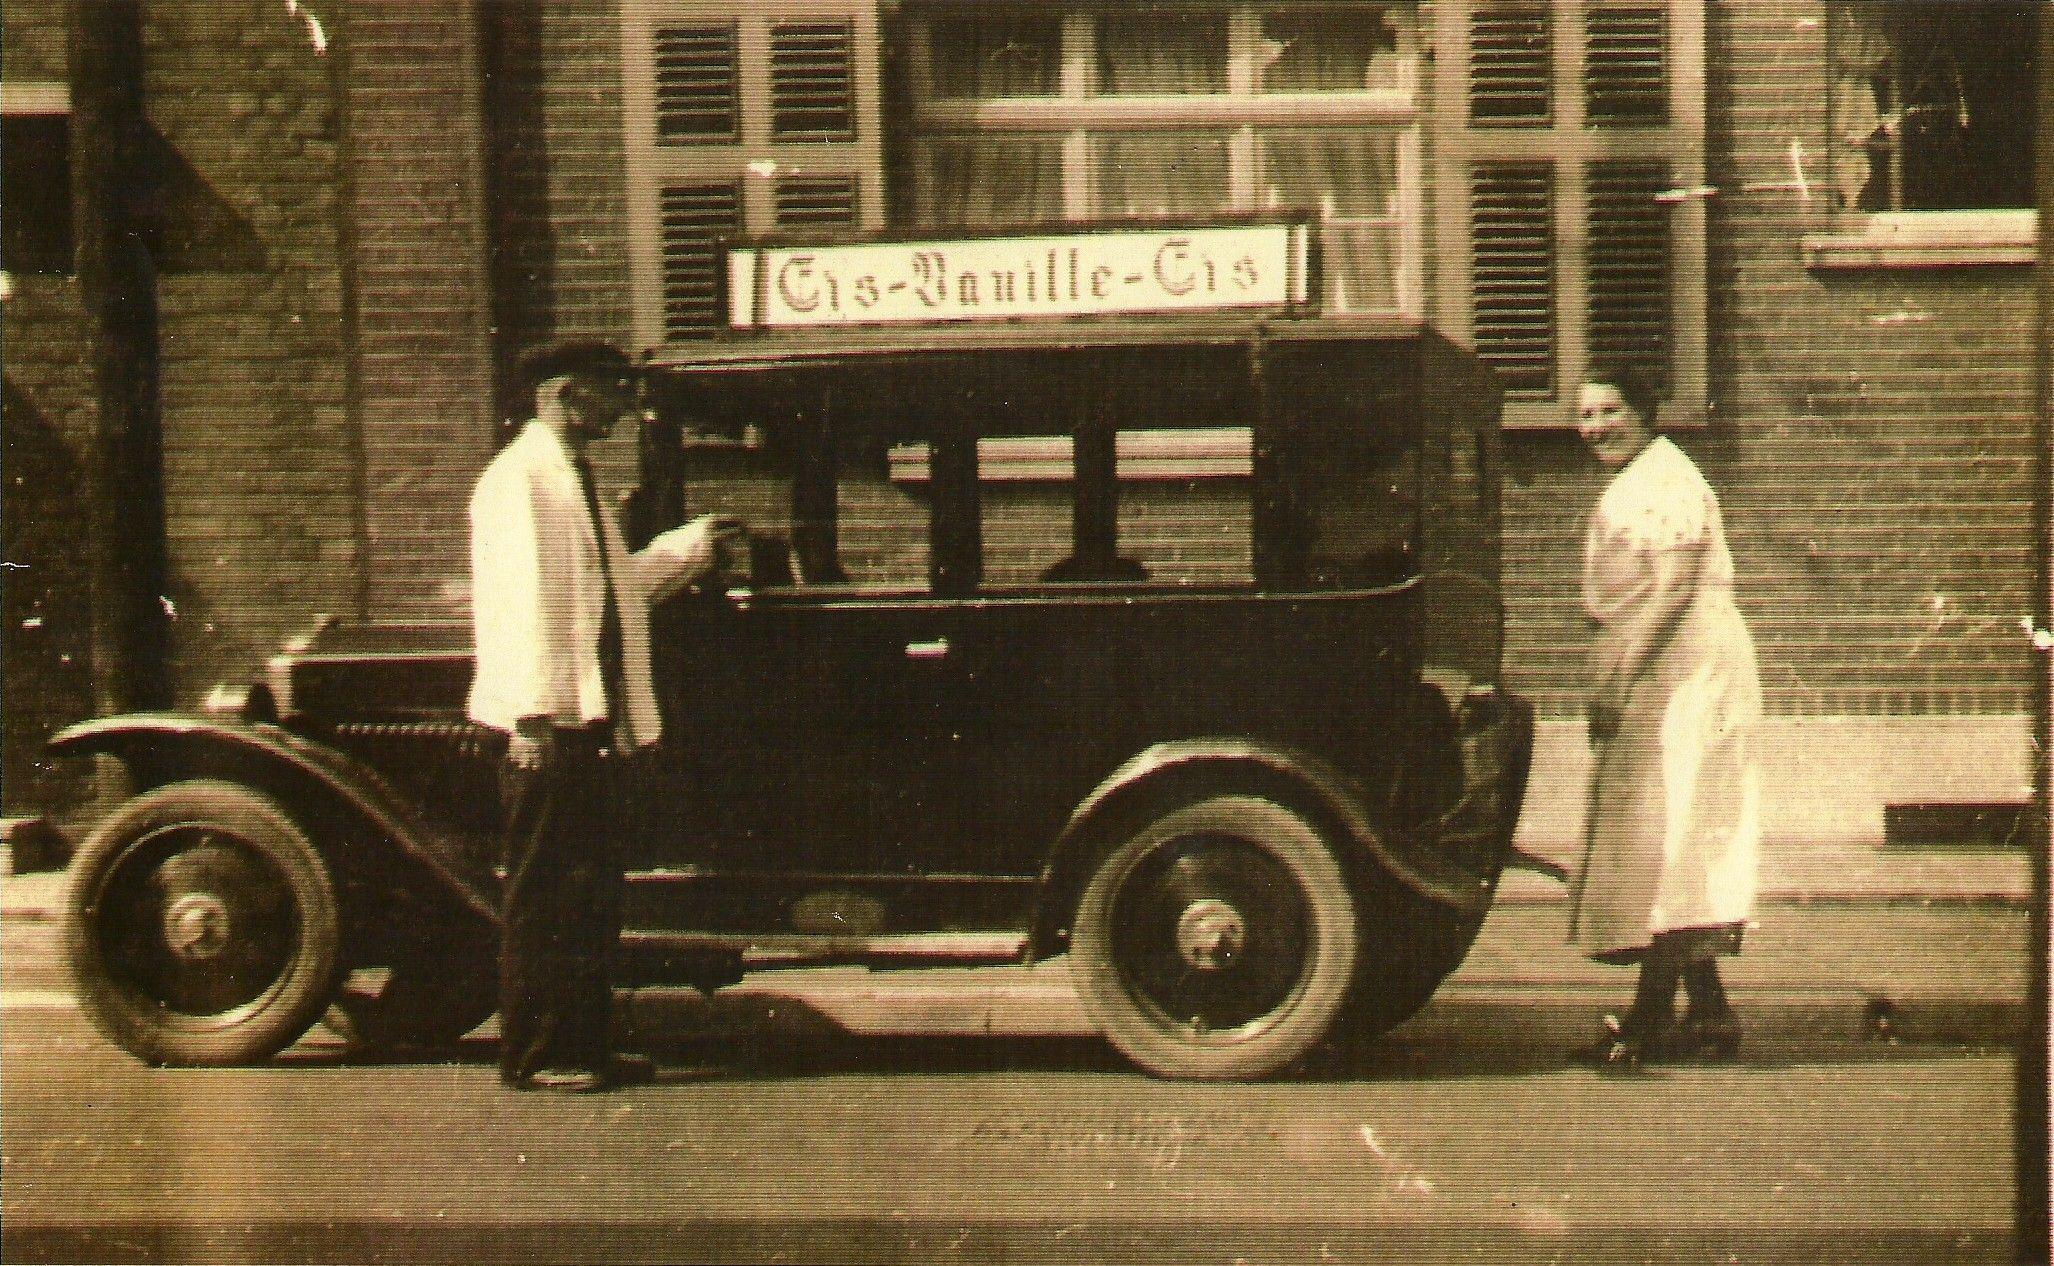 Eiswagen in Alsdorf, 1930